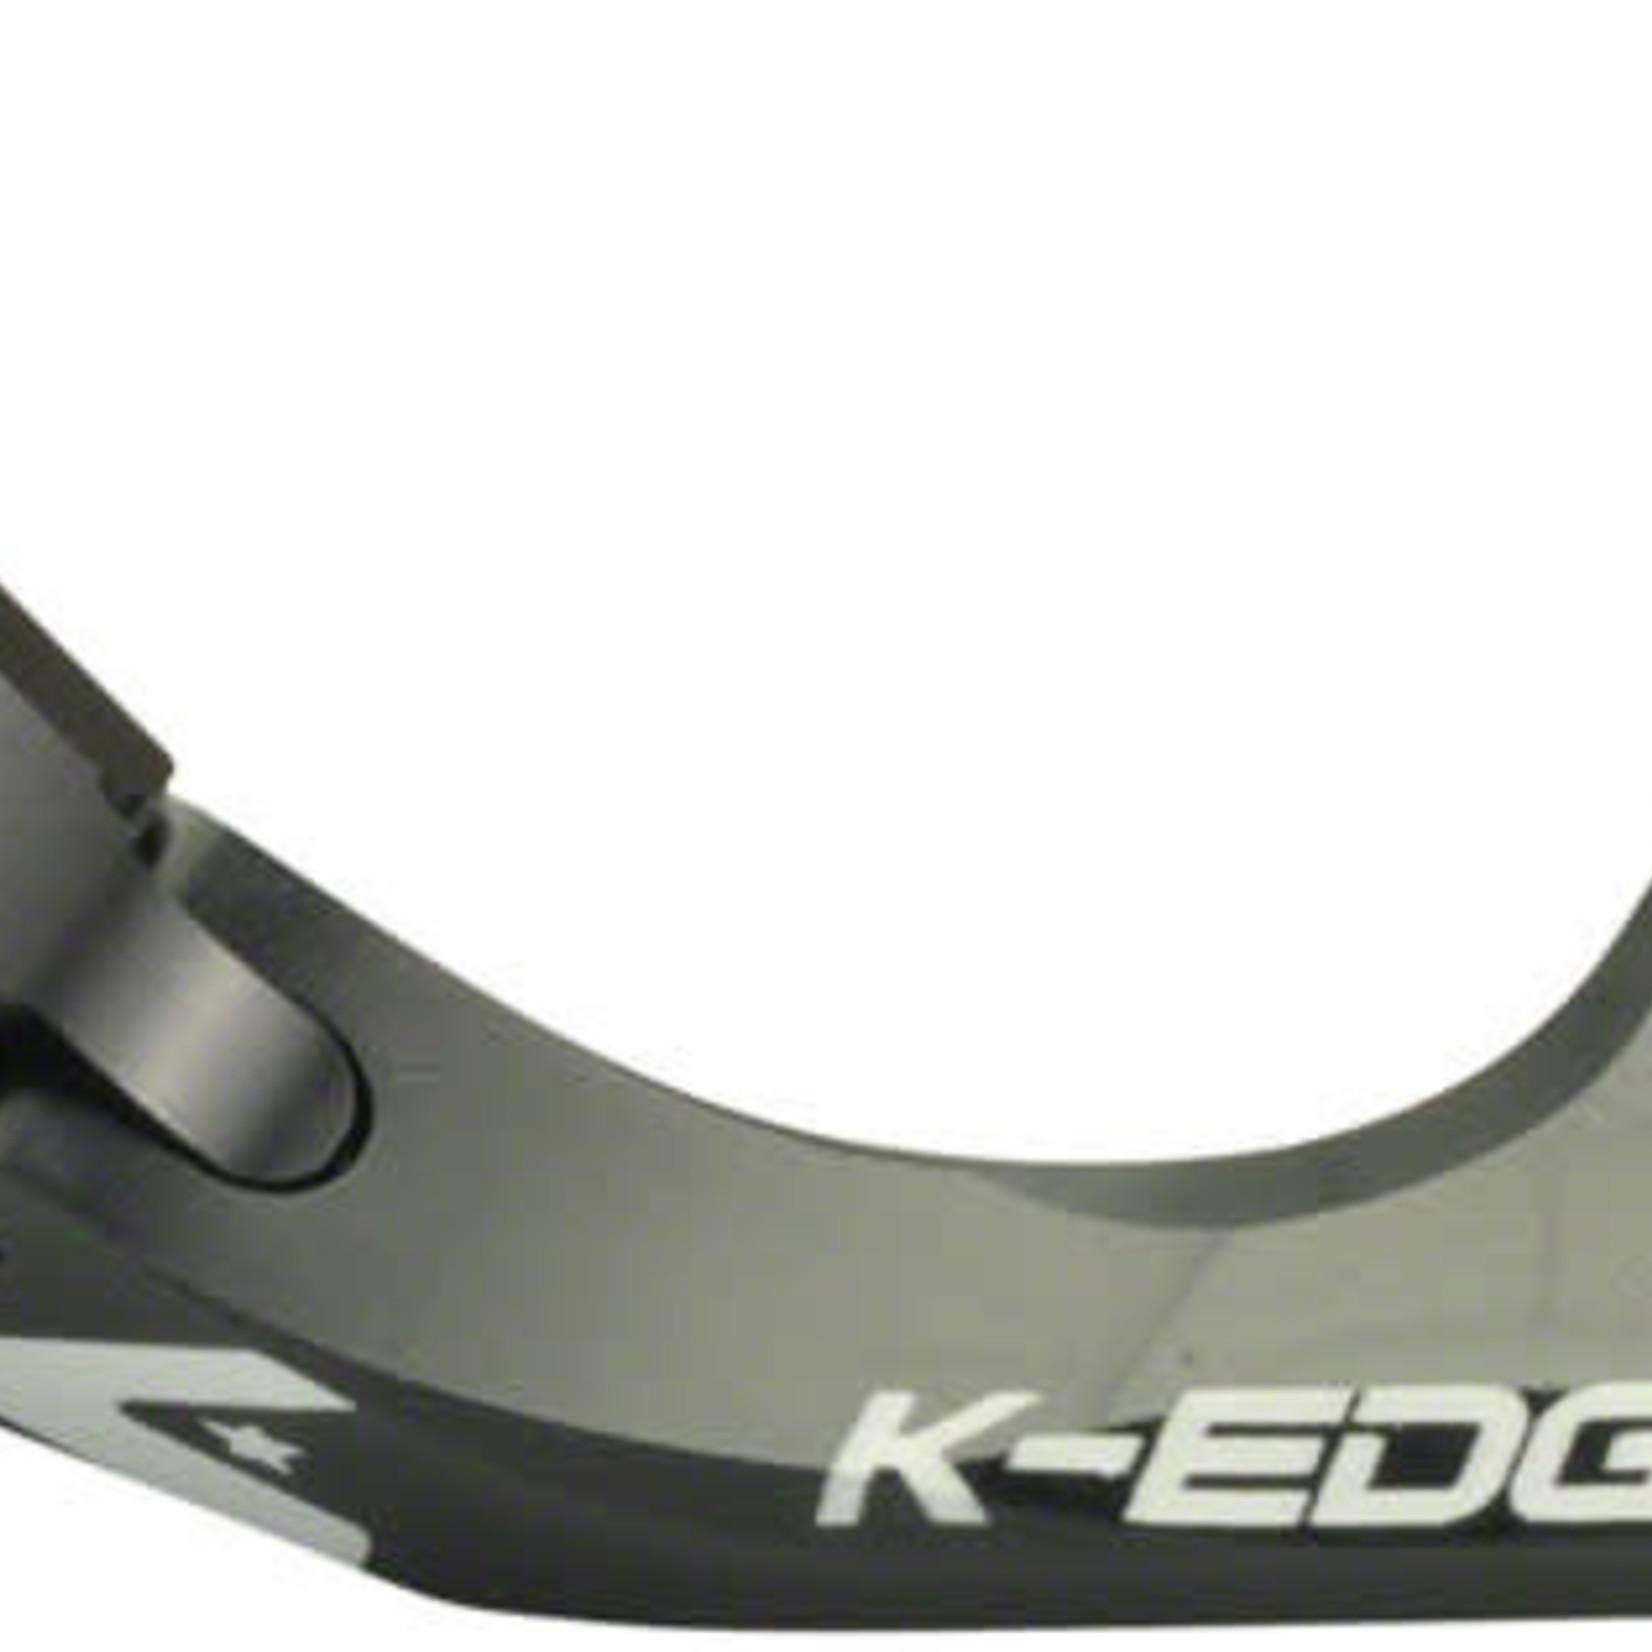 K-Edge K-EDGE Garmin Max Mount - 31.8, Black